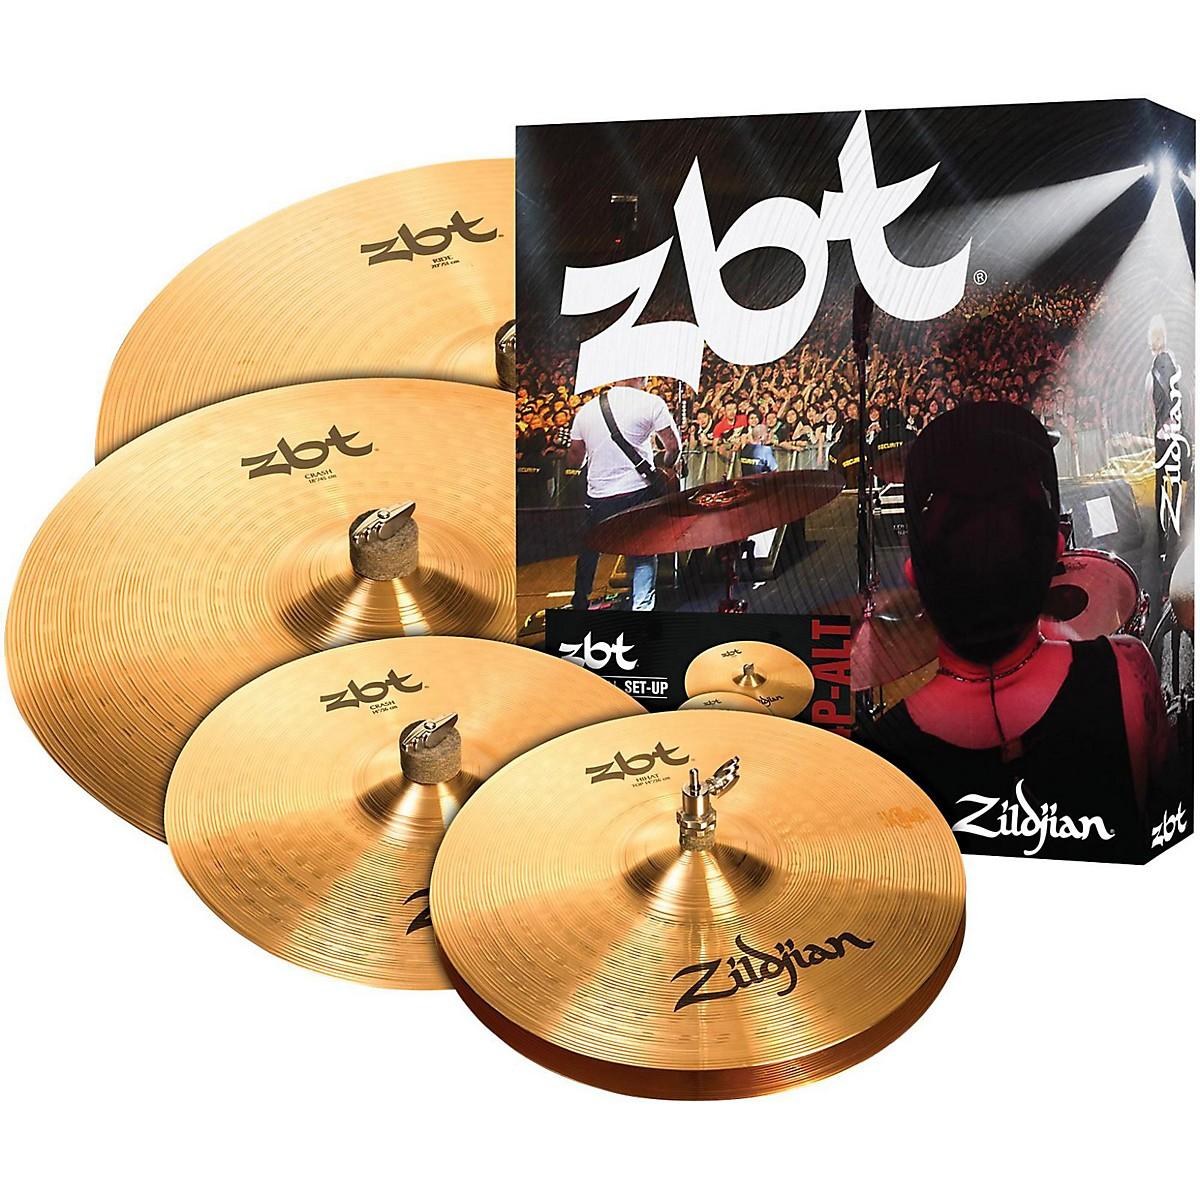 Zildjian ZBT Pro Cymbal Set With Free 14